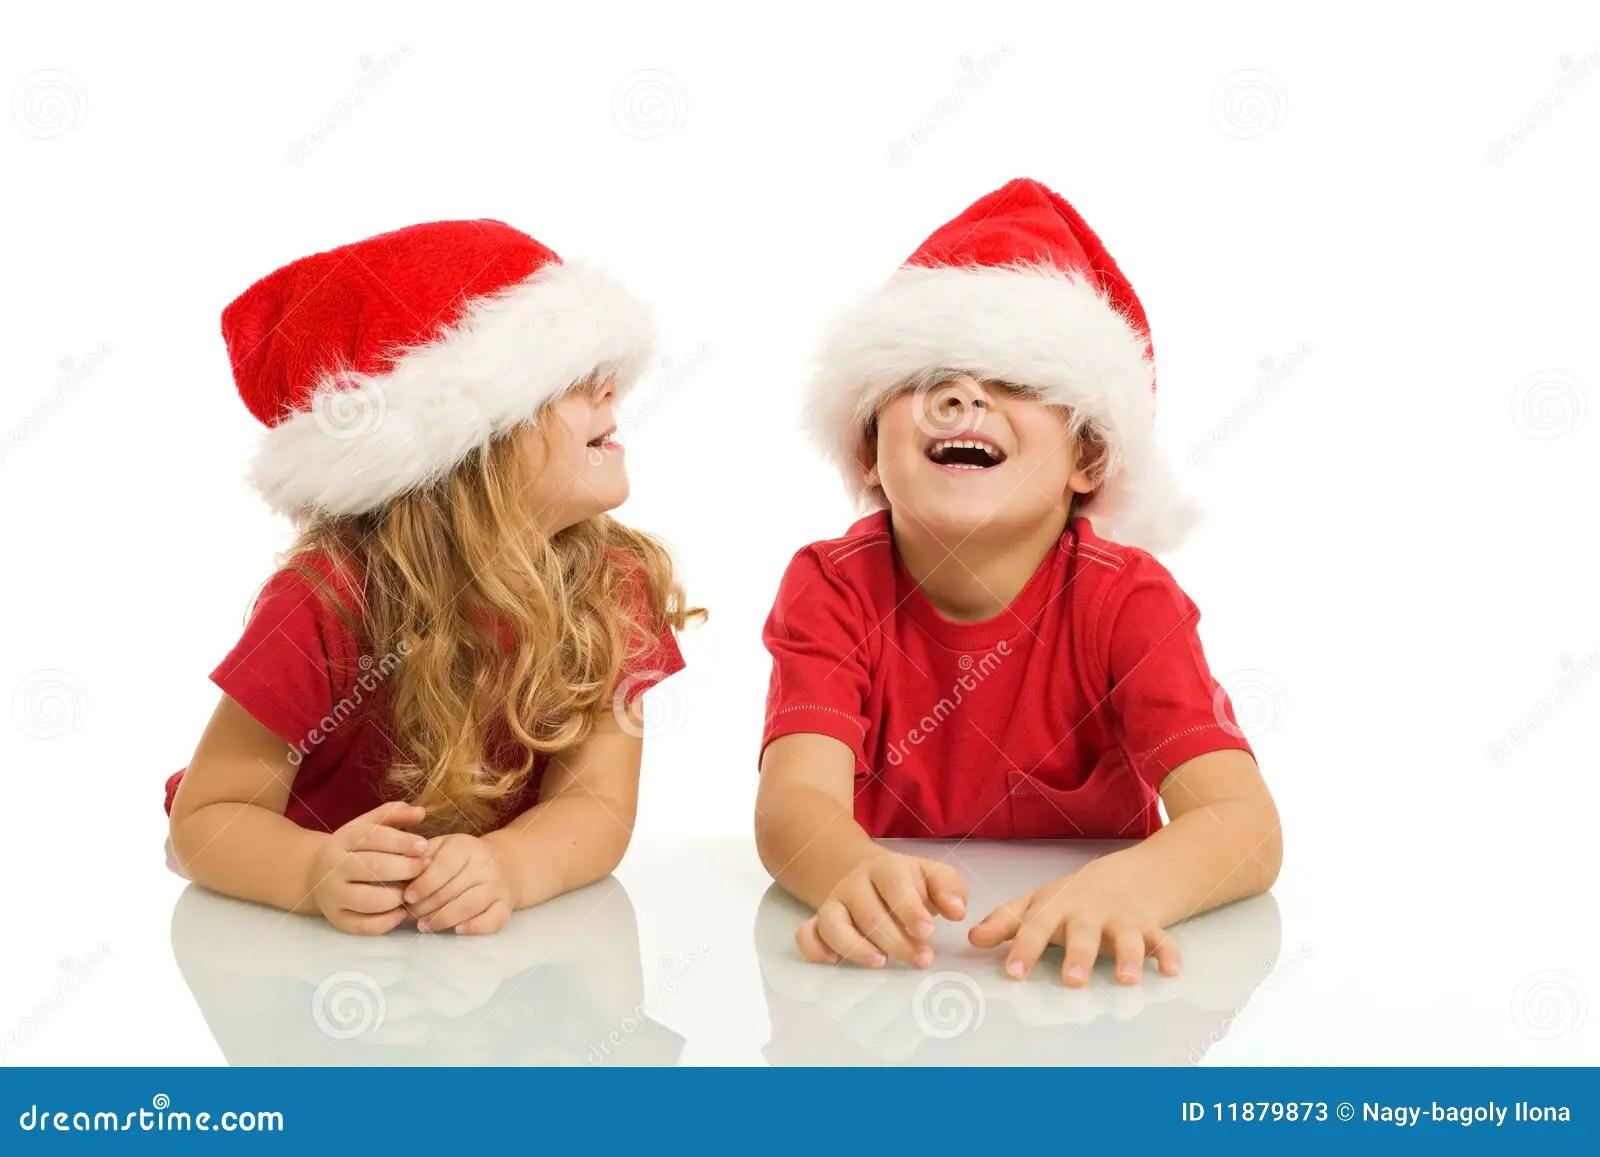 Kids Having Fun With Christmas Hats Stock Photos Image